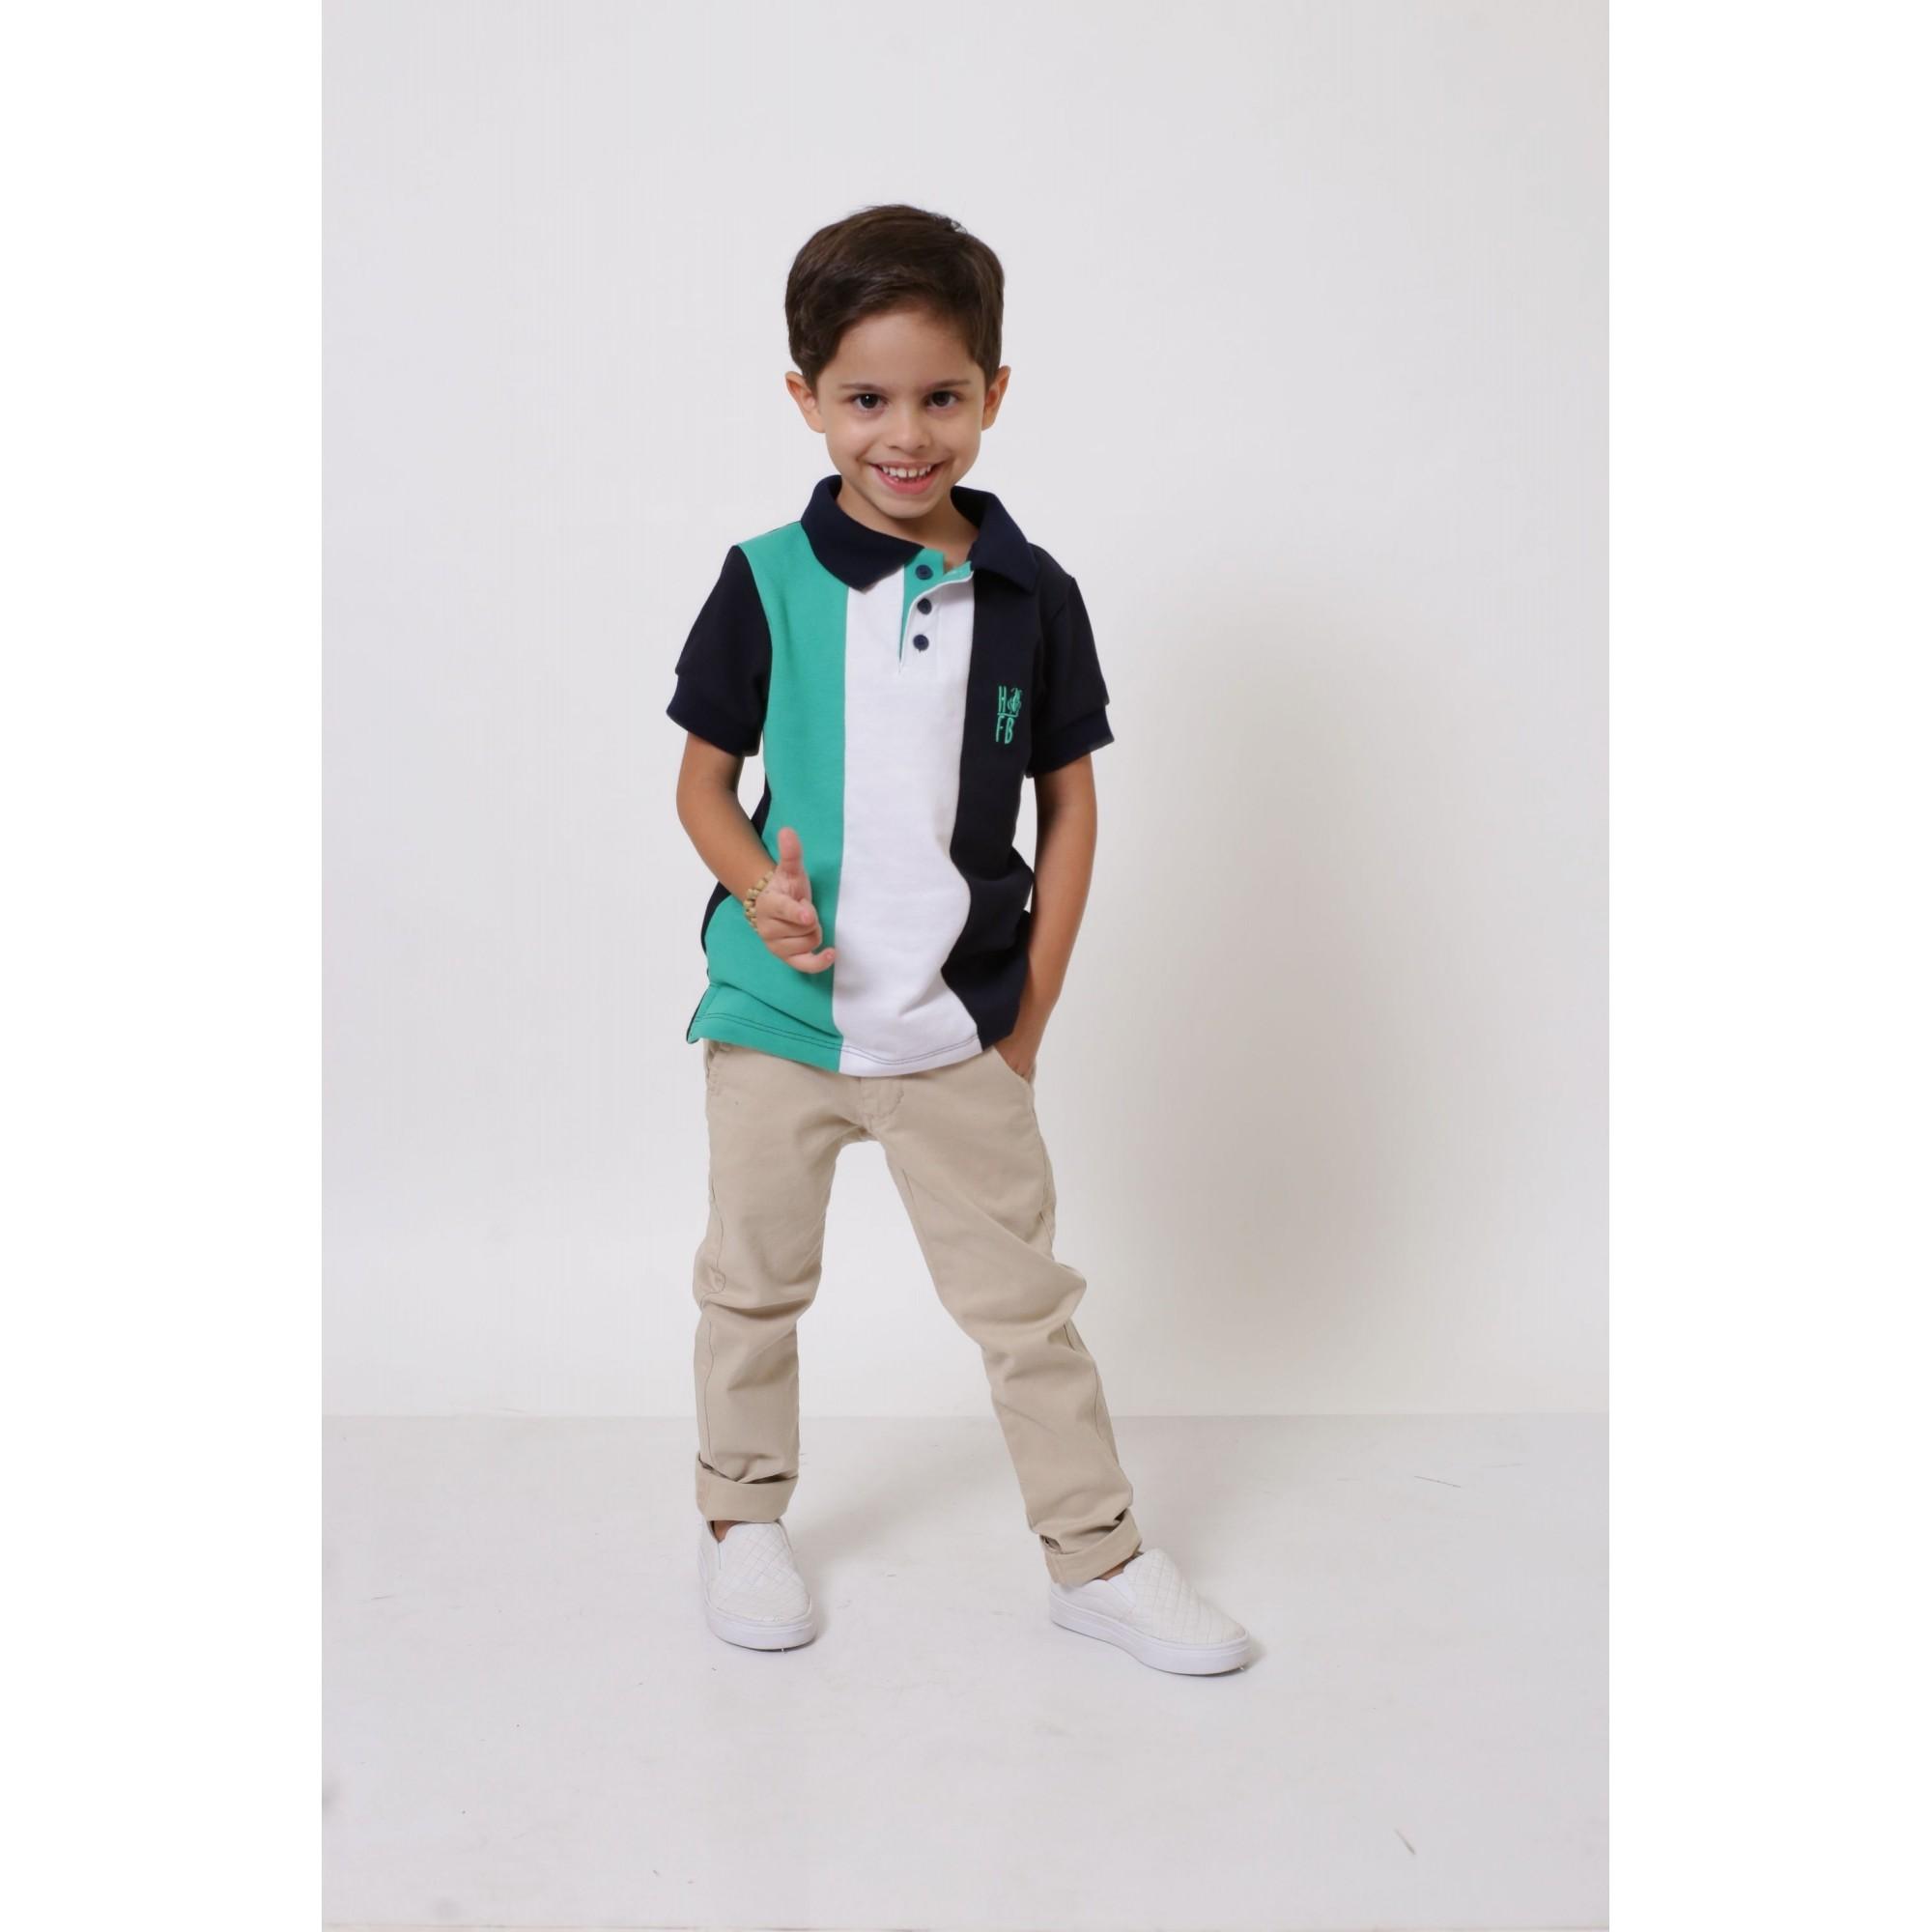 MÃE E FILHO > Kit 02 peças - Camisas ou Body Polo - Listrados Prince [Coleção Tal Mãe Tal Filho]  - Heitor Fashion Brazil